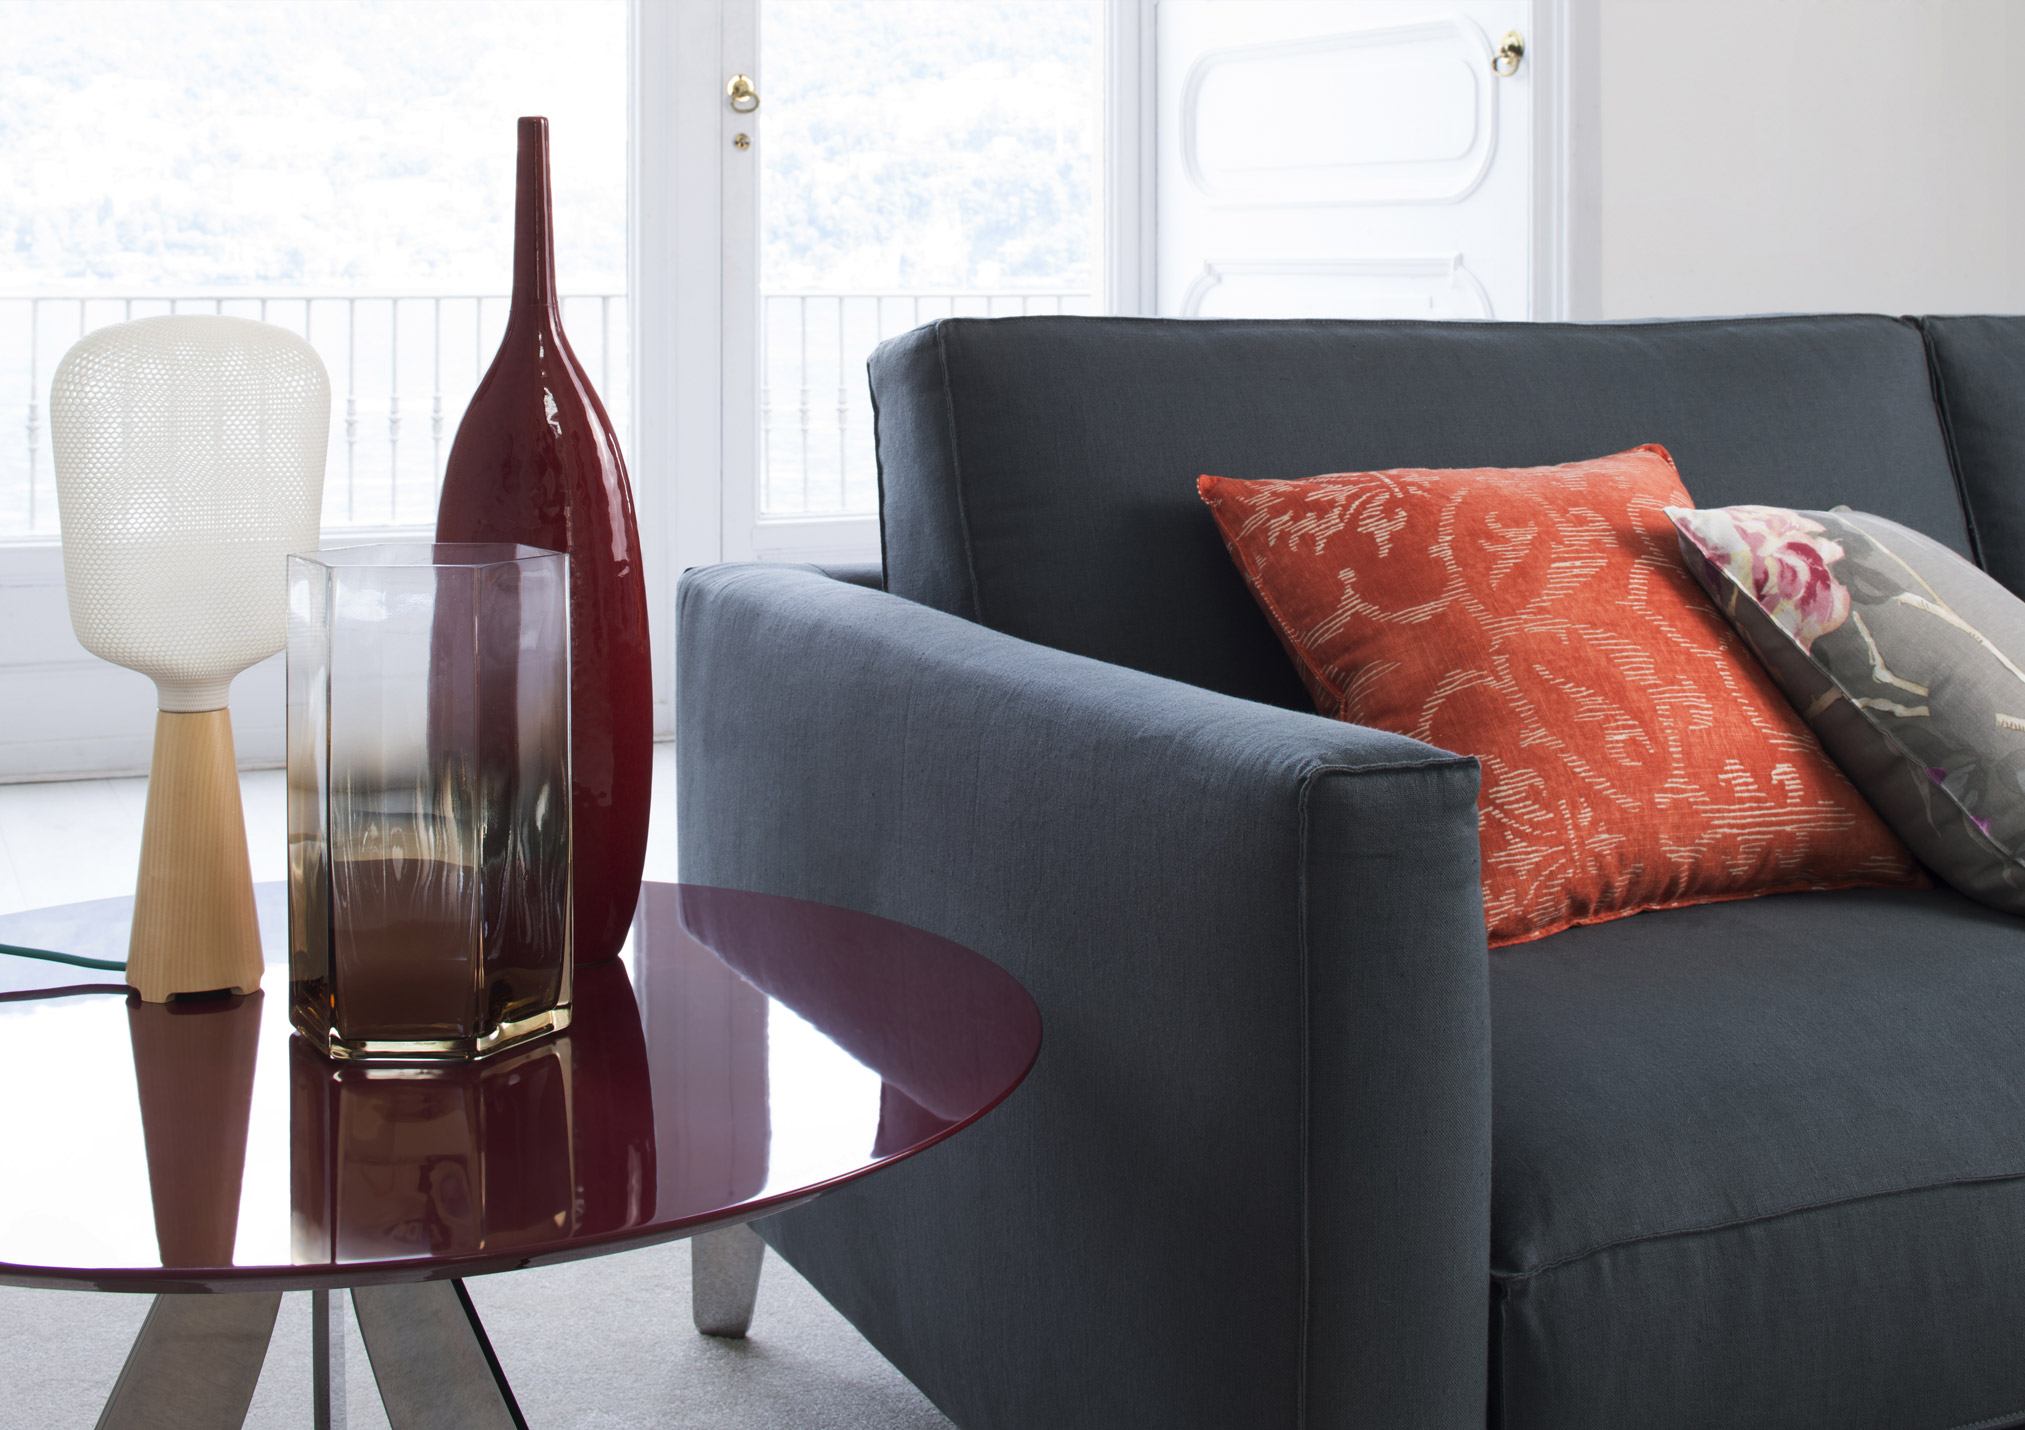 Lampe design Afillia 3D online